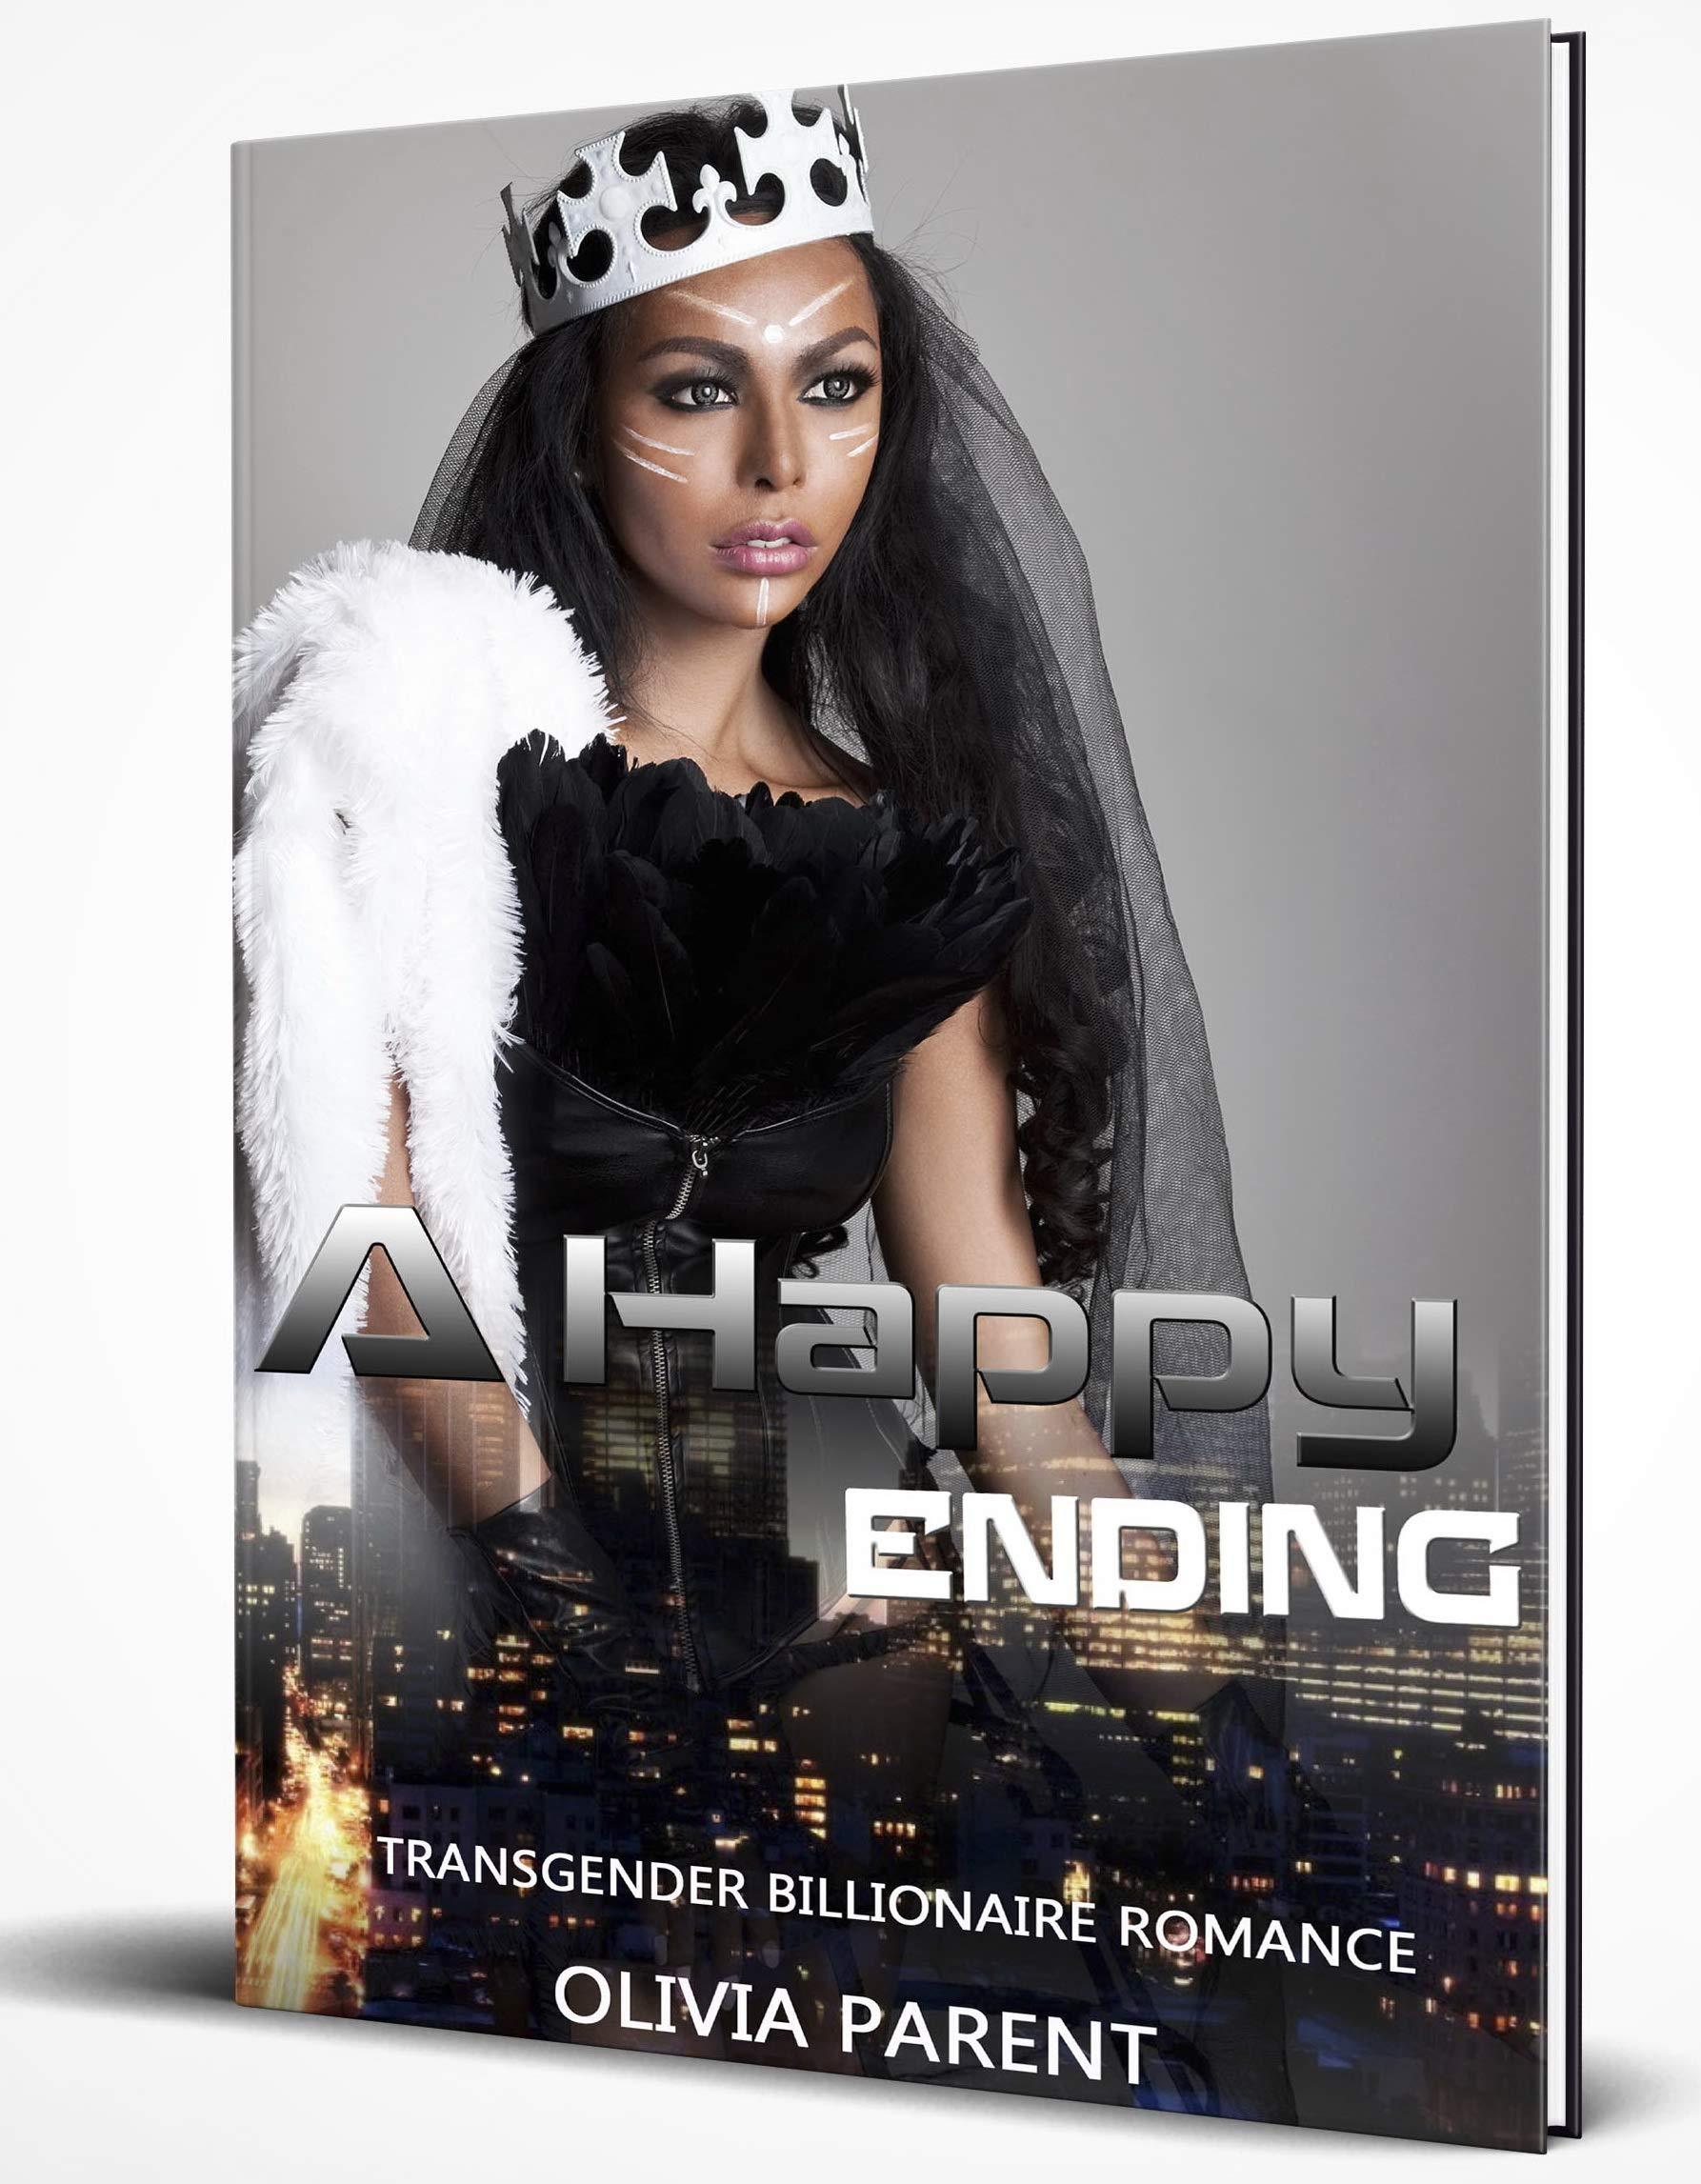 A Happy Ending : Transgender Billionaire Romance